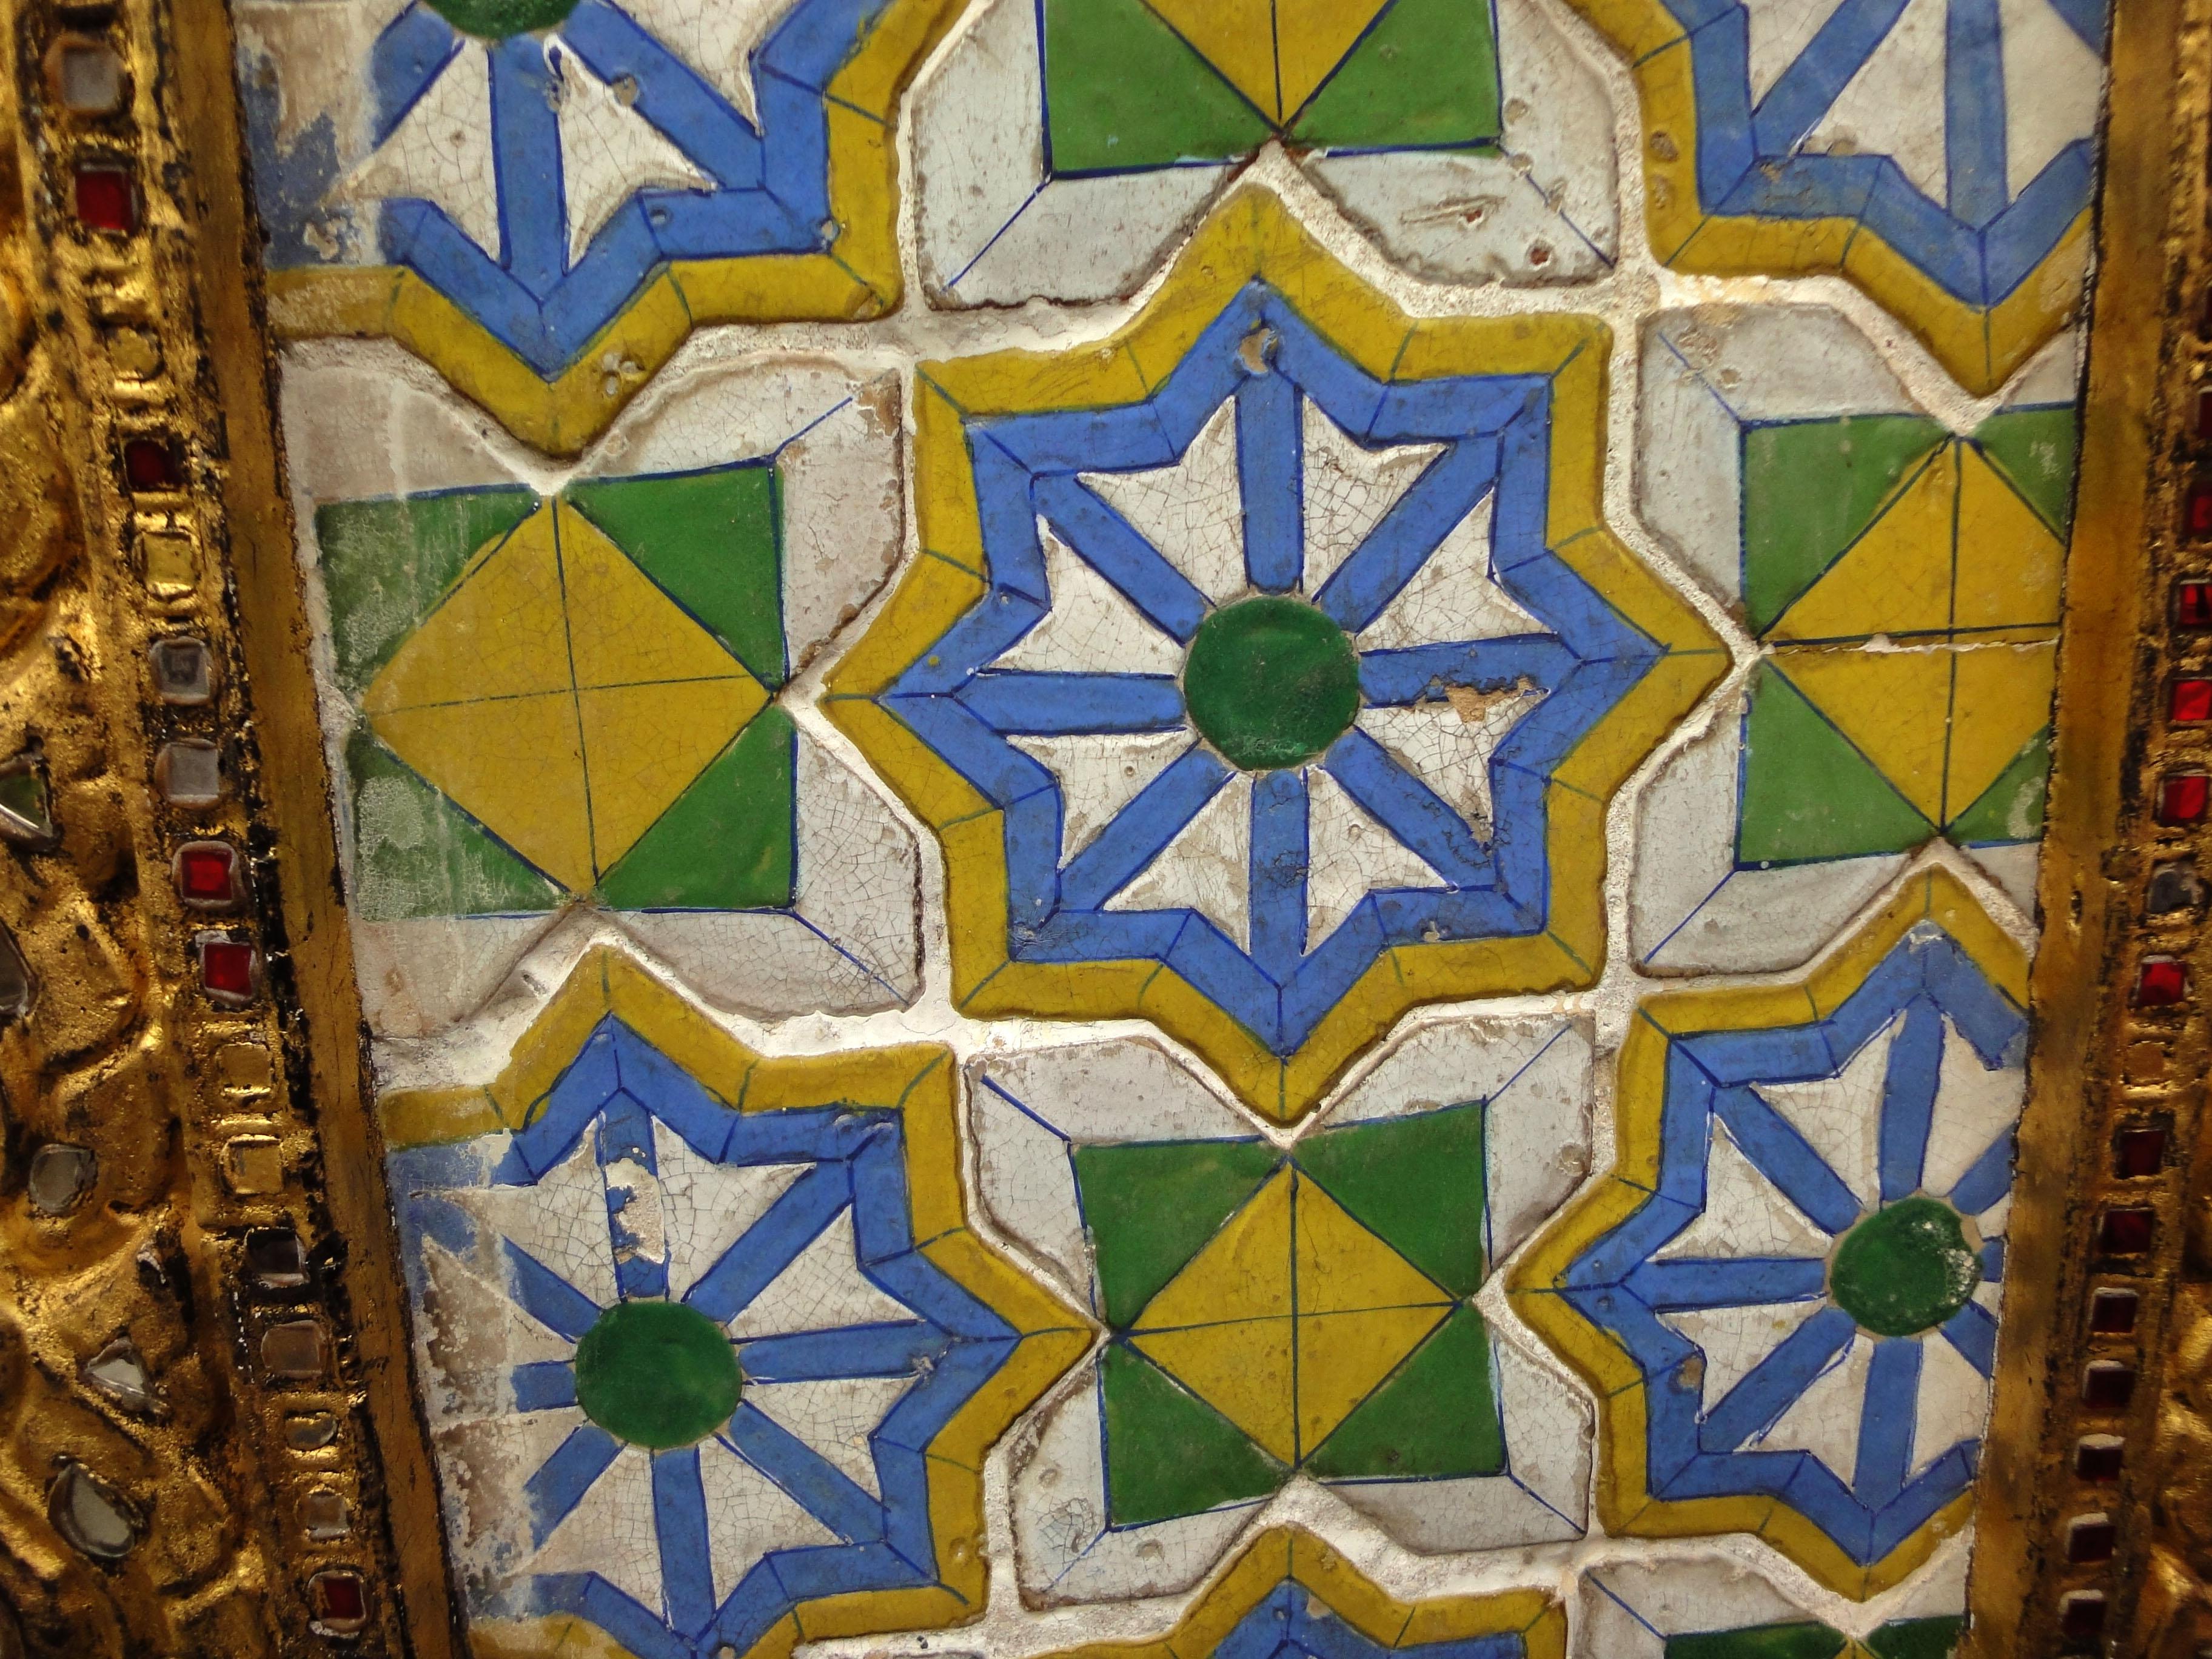 Grand Palace beautifully designed Chinese Mosaic tiles Bangkok Thailand 01